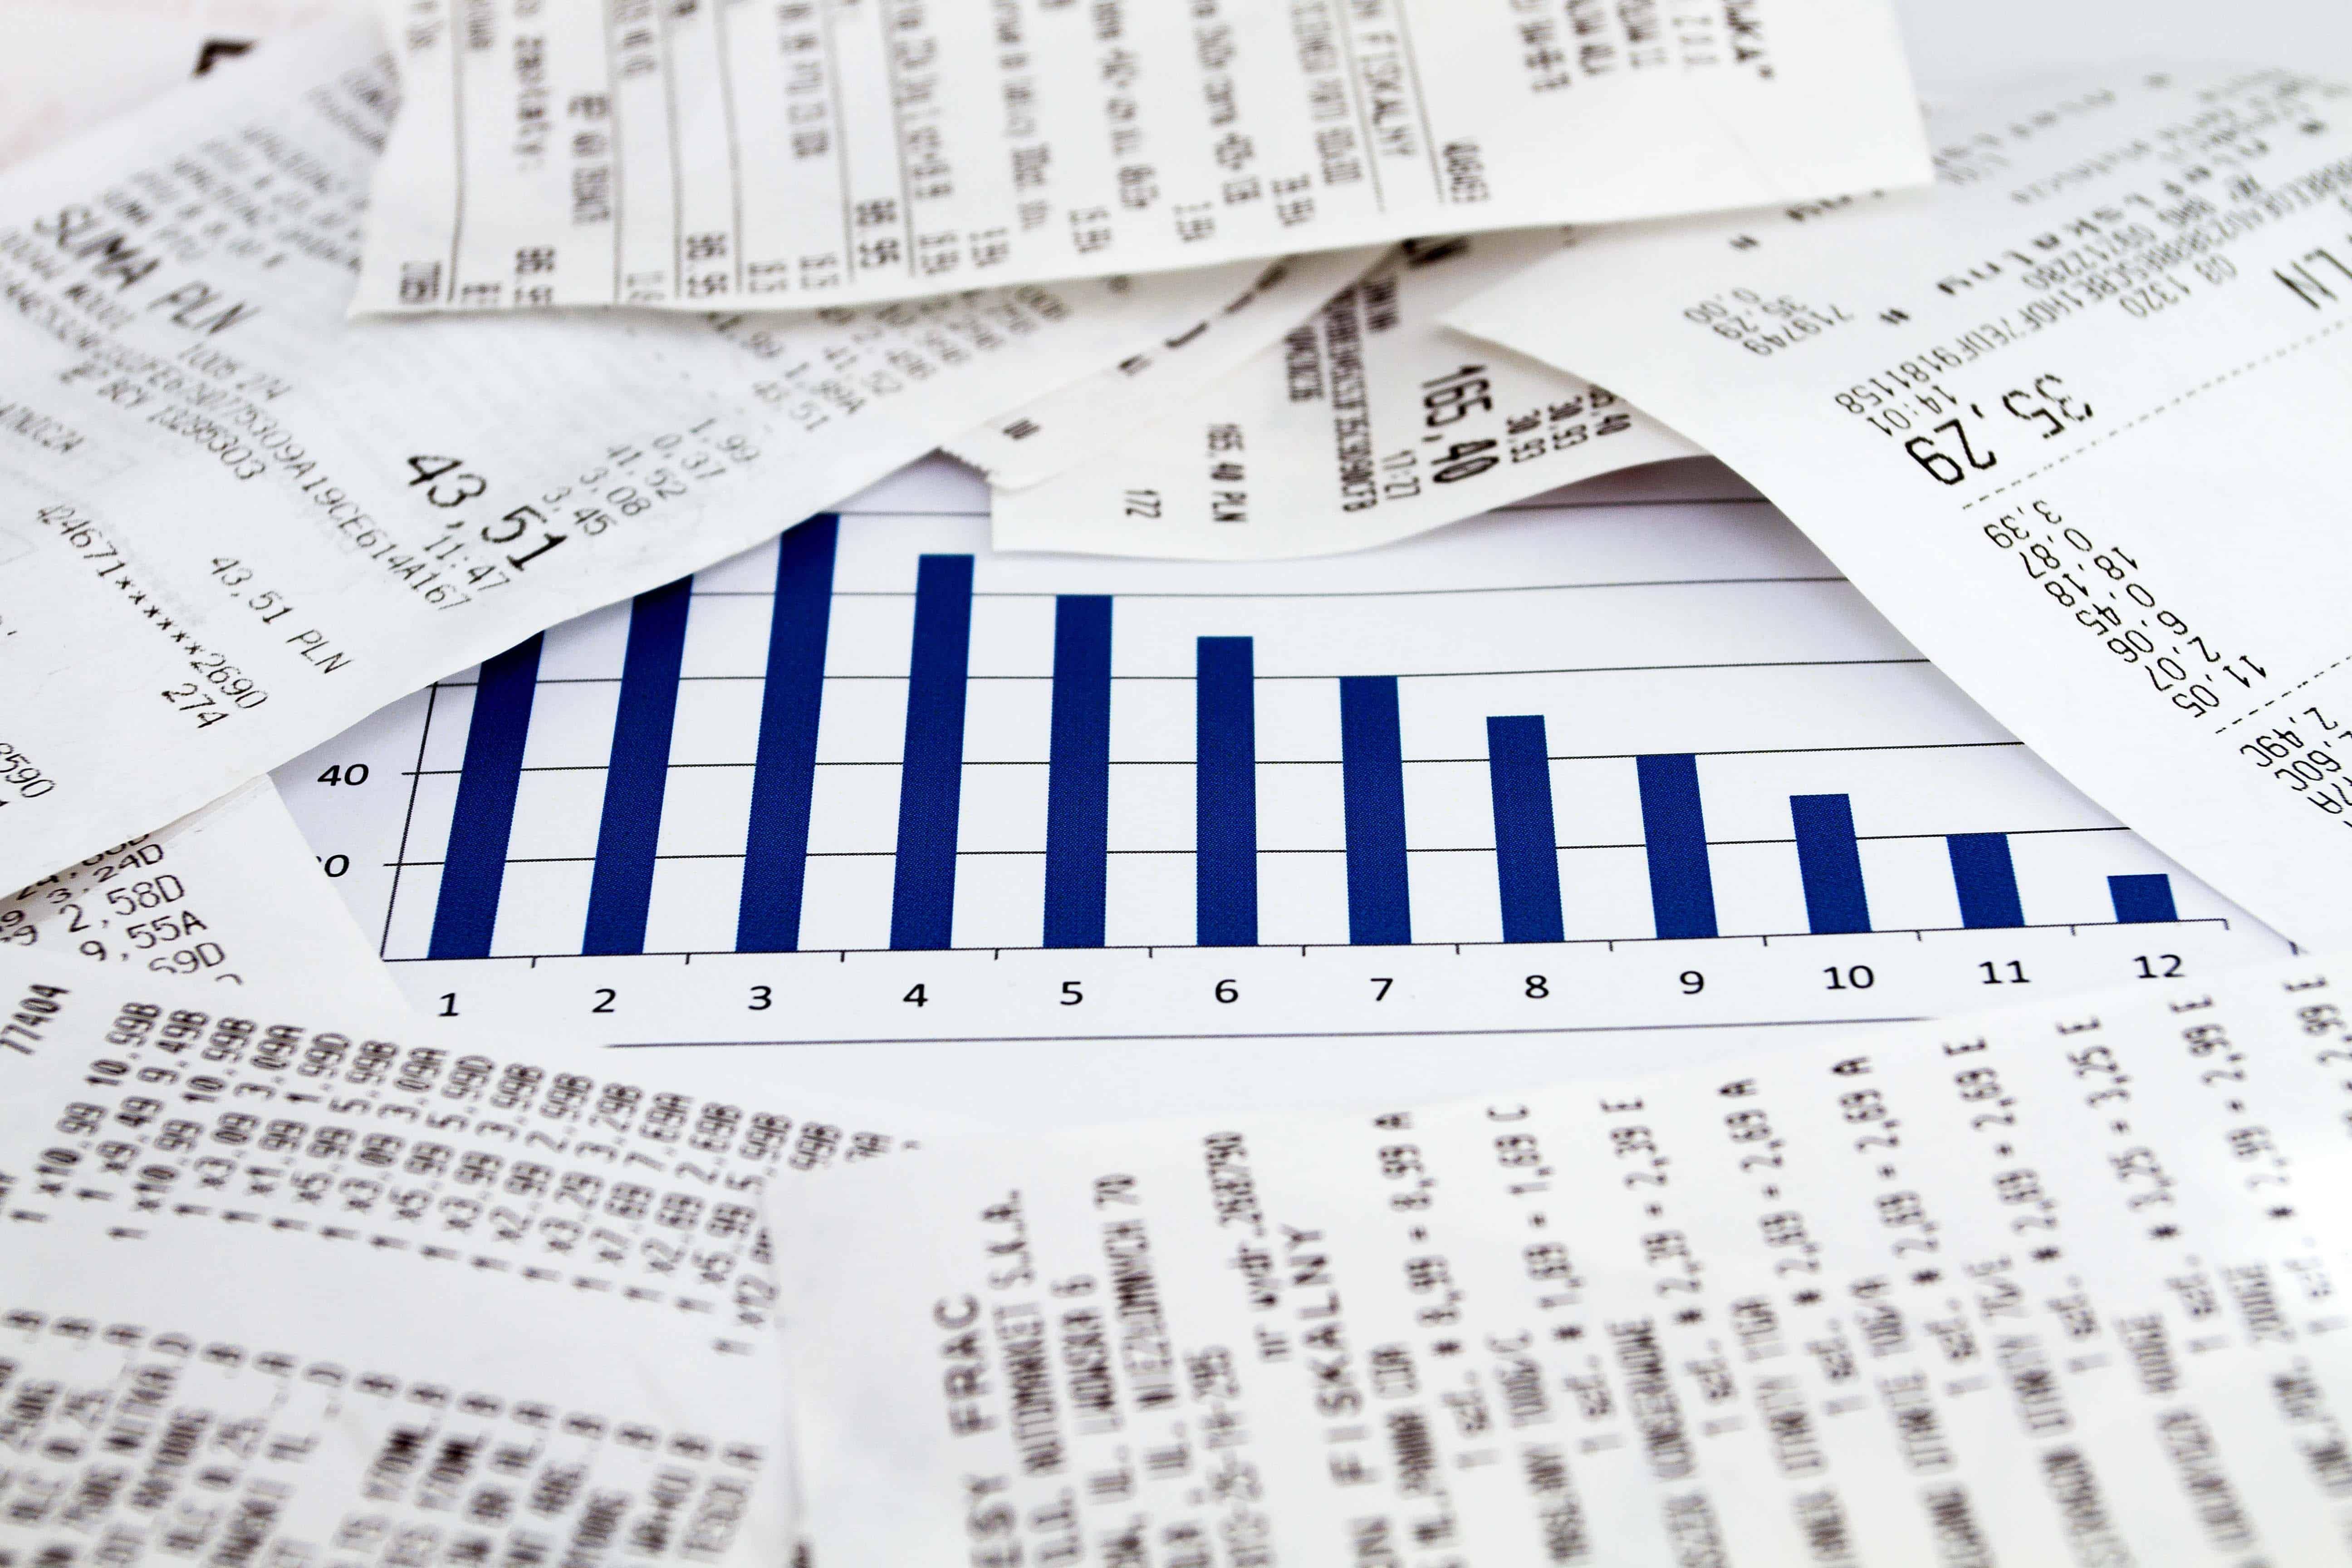 Liquidation of an enterprise - employee benefits: compensation, severance pay 78